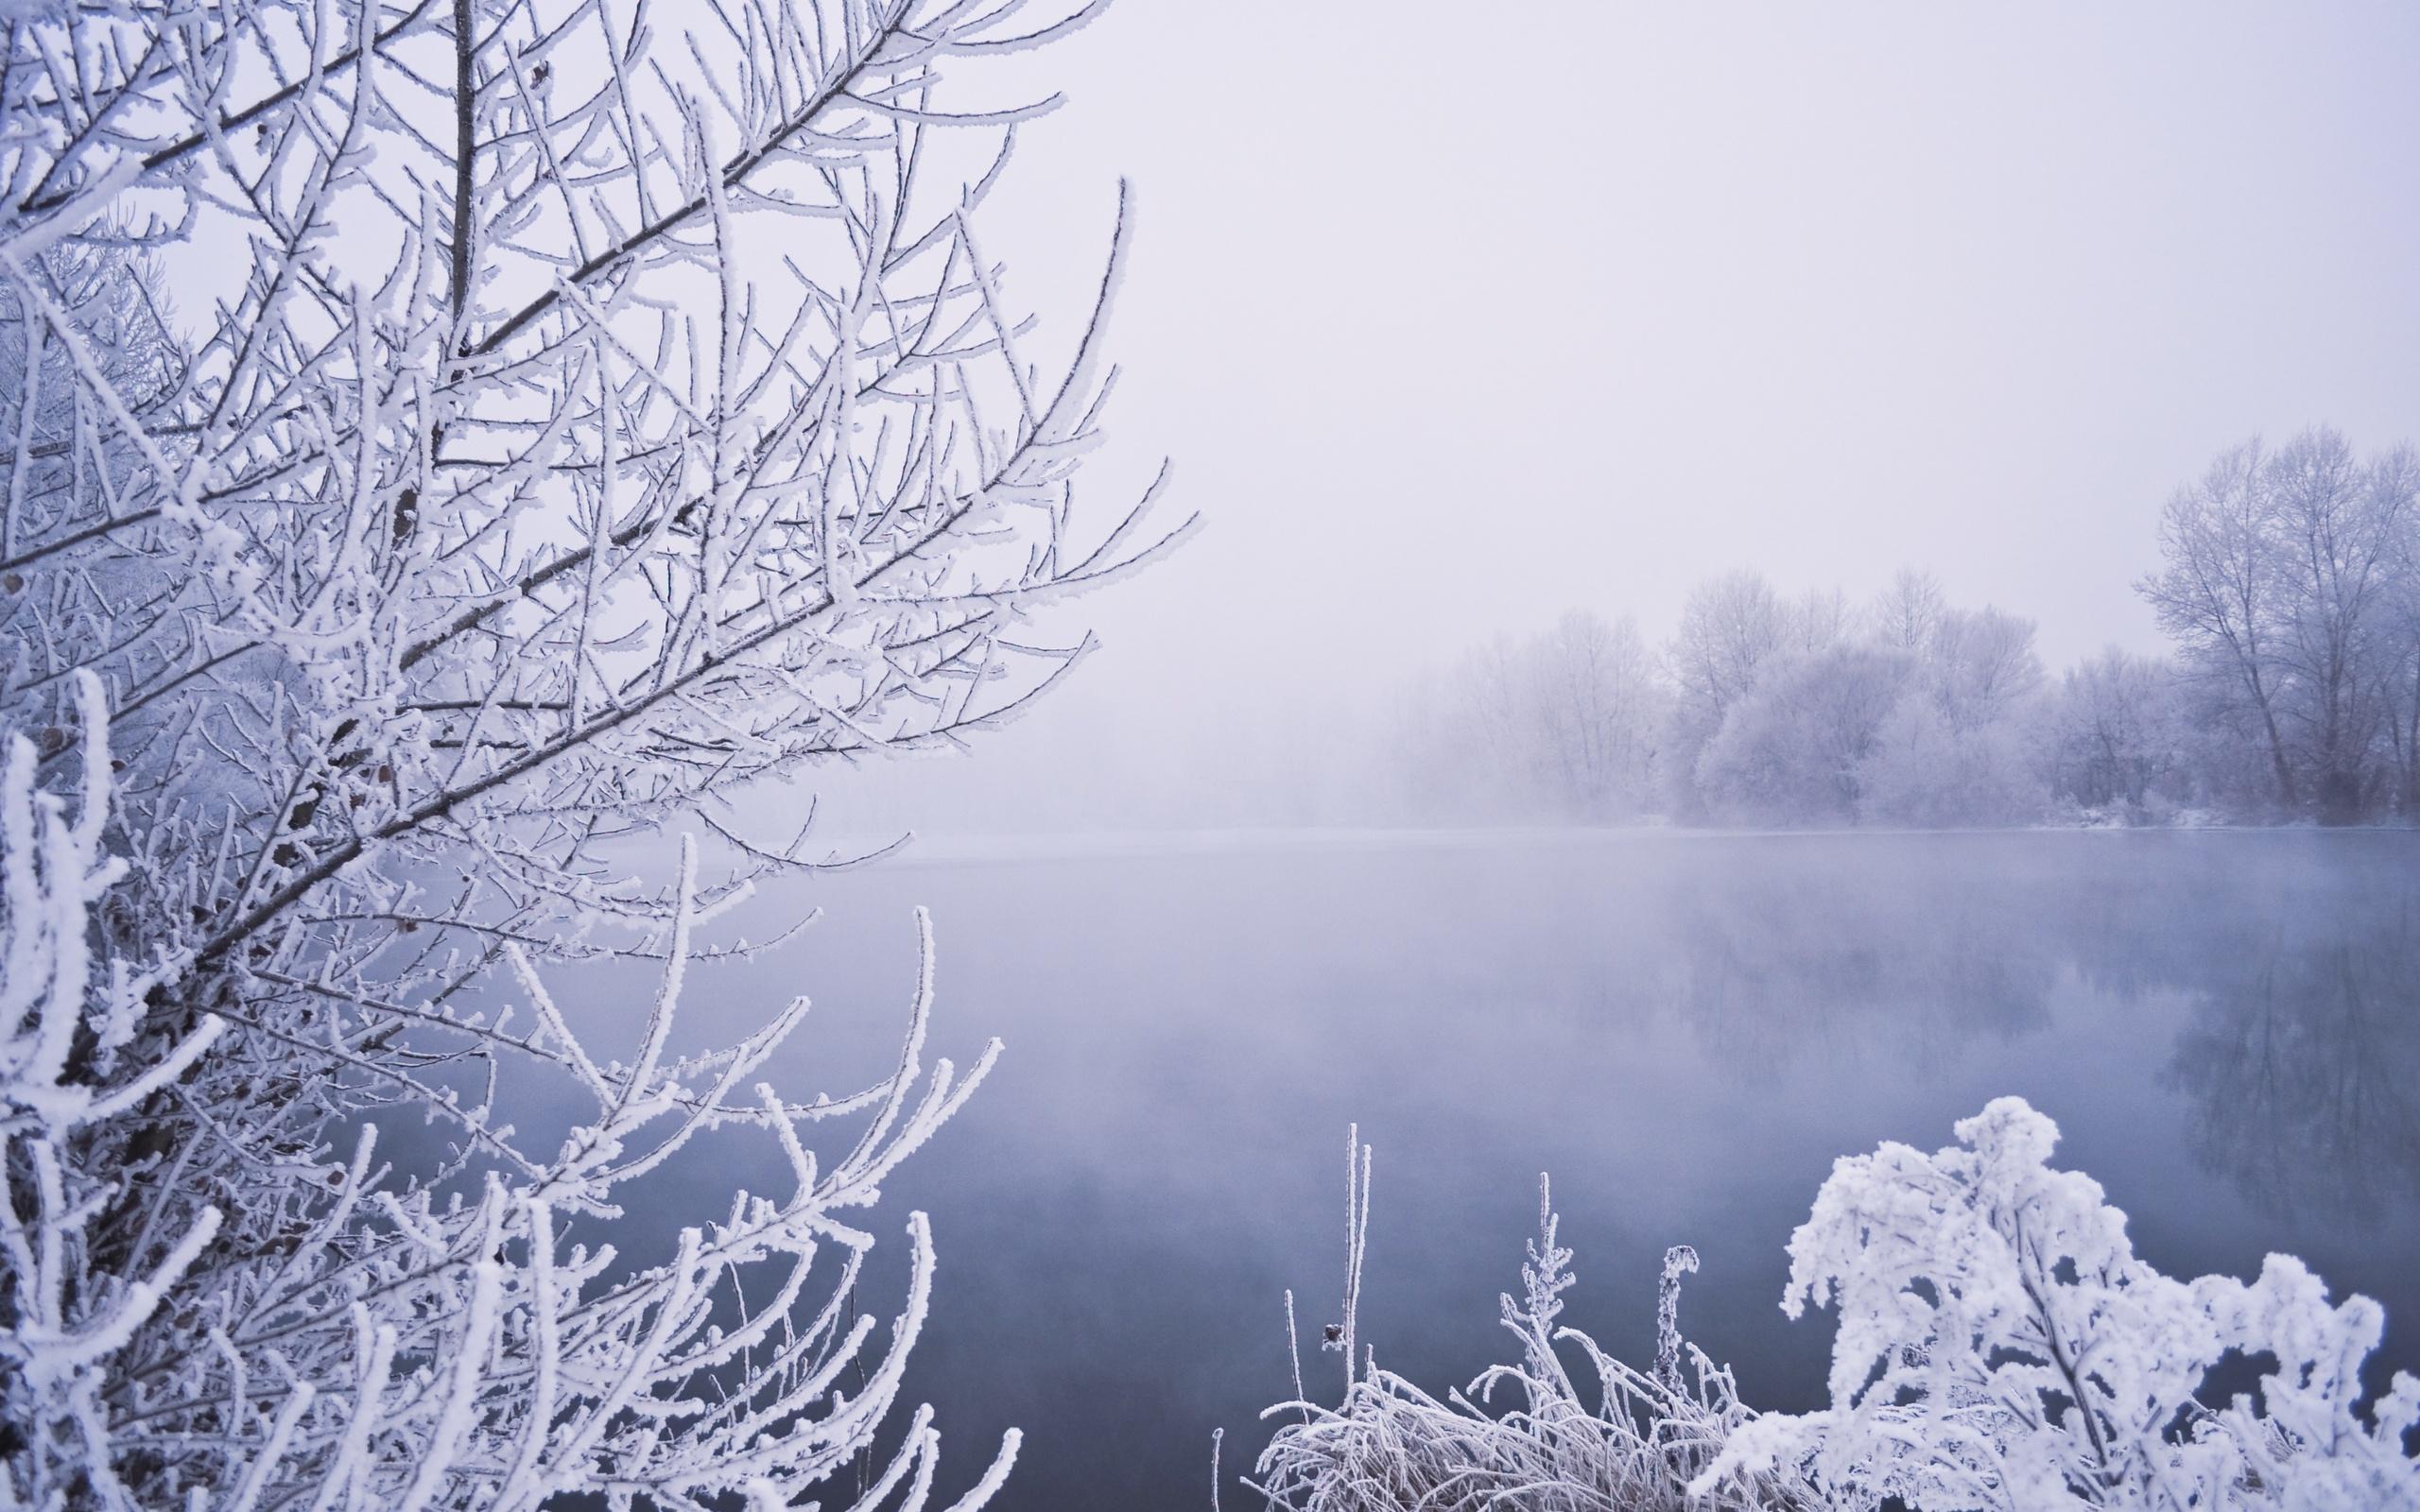 фото картинки инея дождя и снега церемонии уже успели